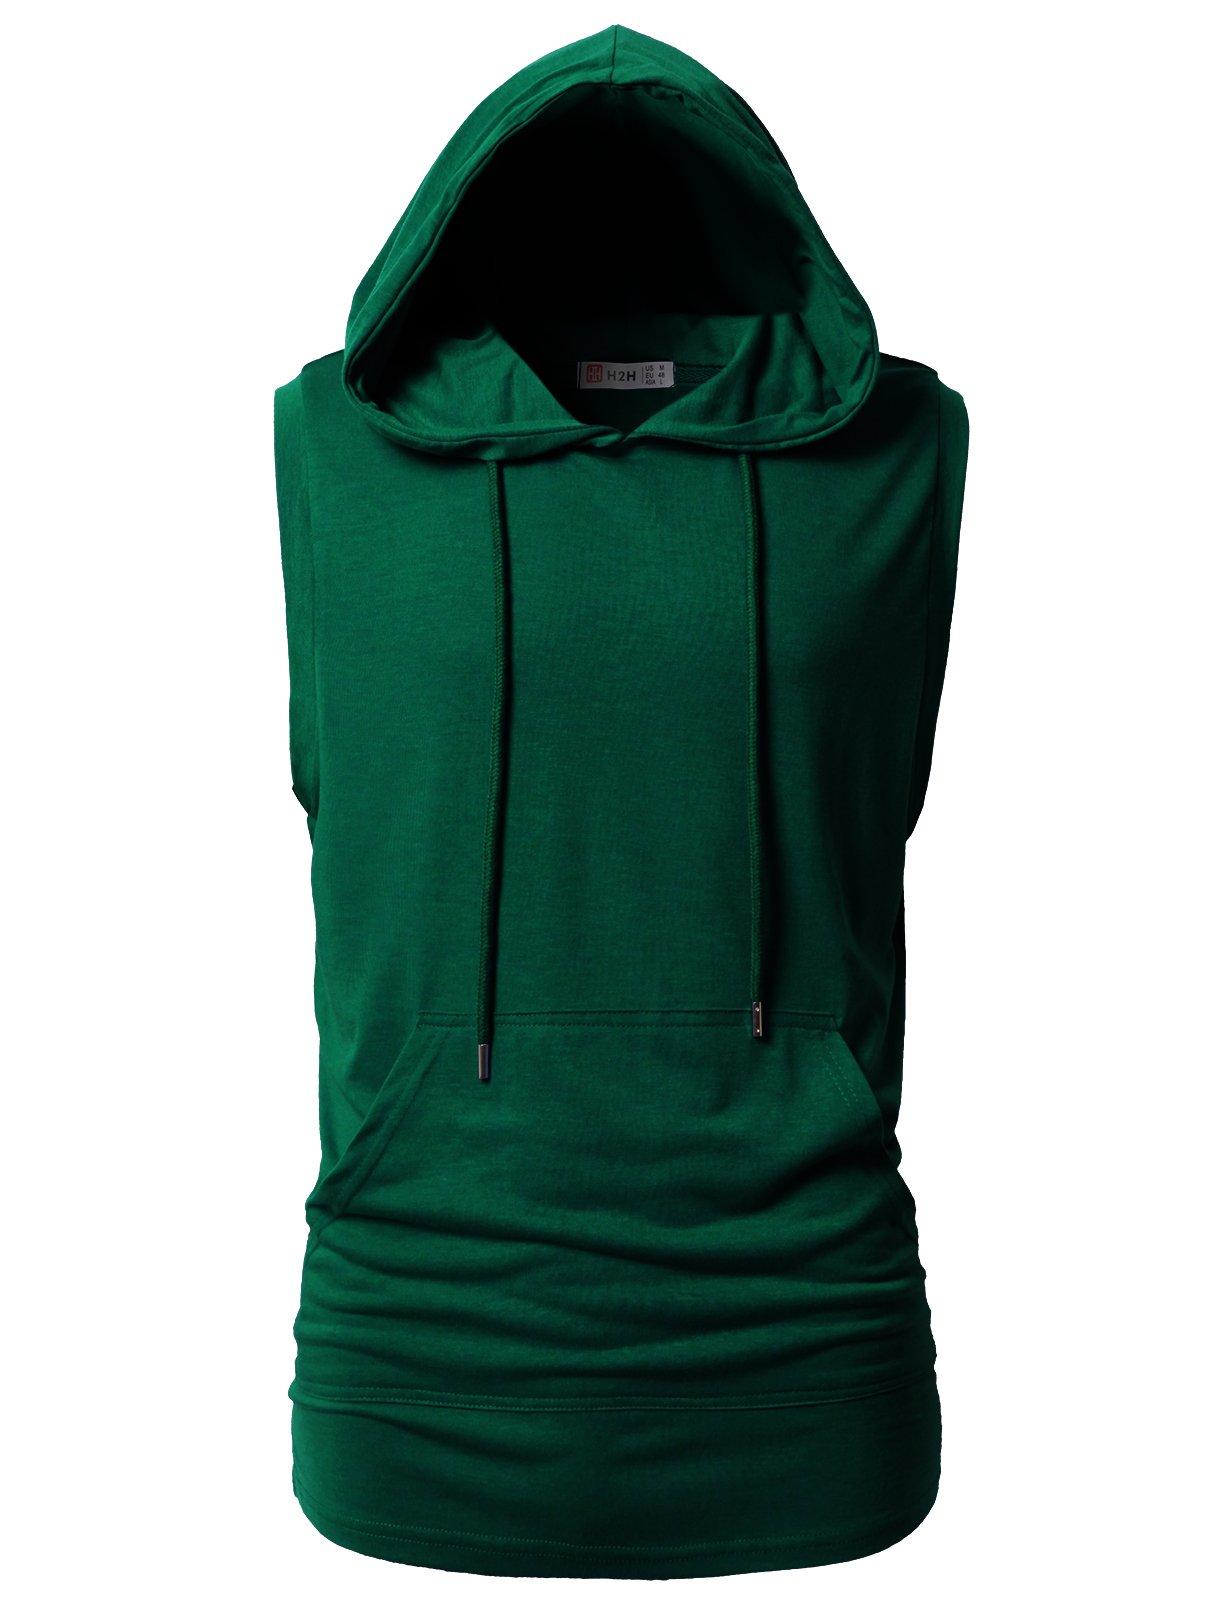 H2H Mens Casual Slim Fit Hooded Tank-Top DarkGreen US XL/Asia 2XL (CMTTK028)